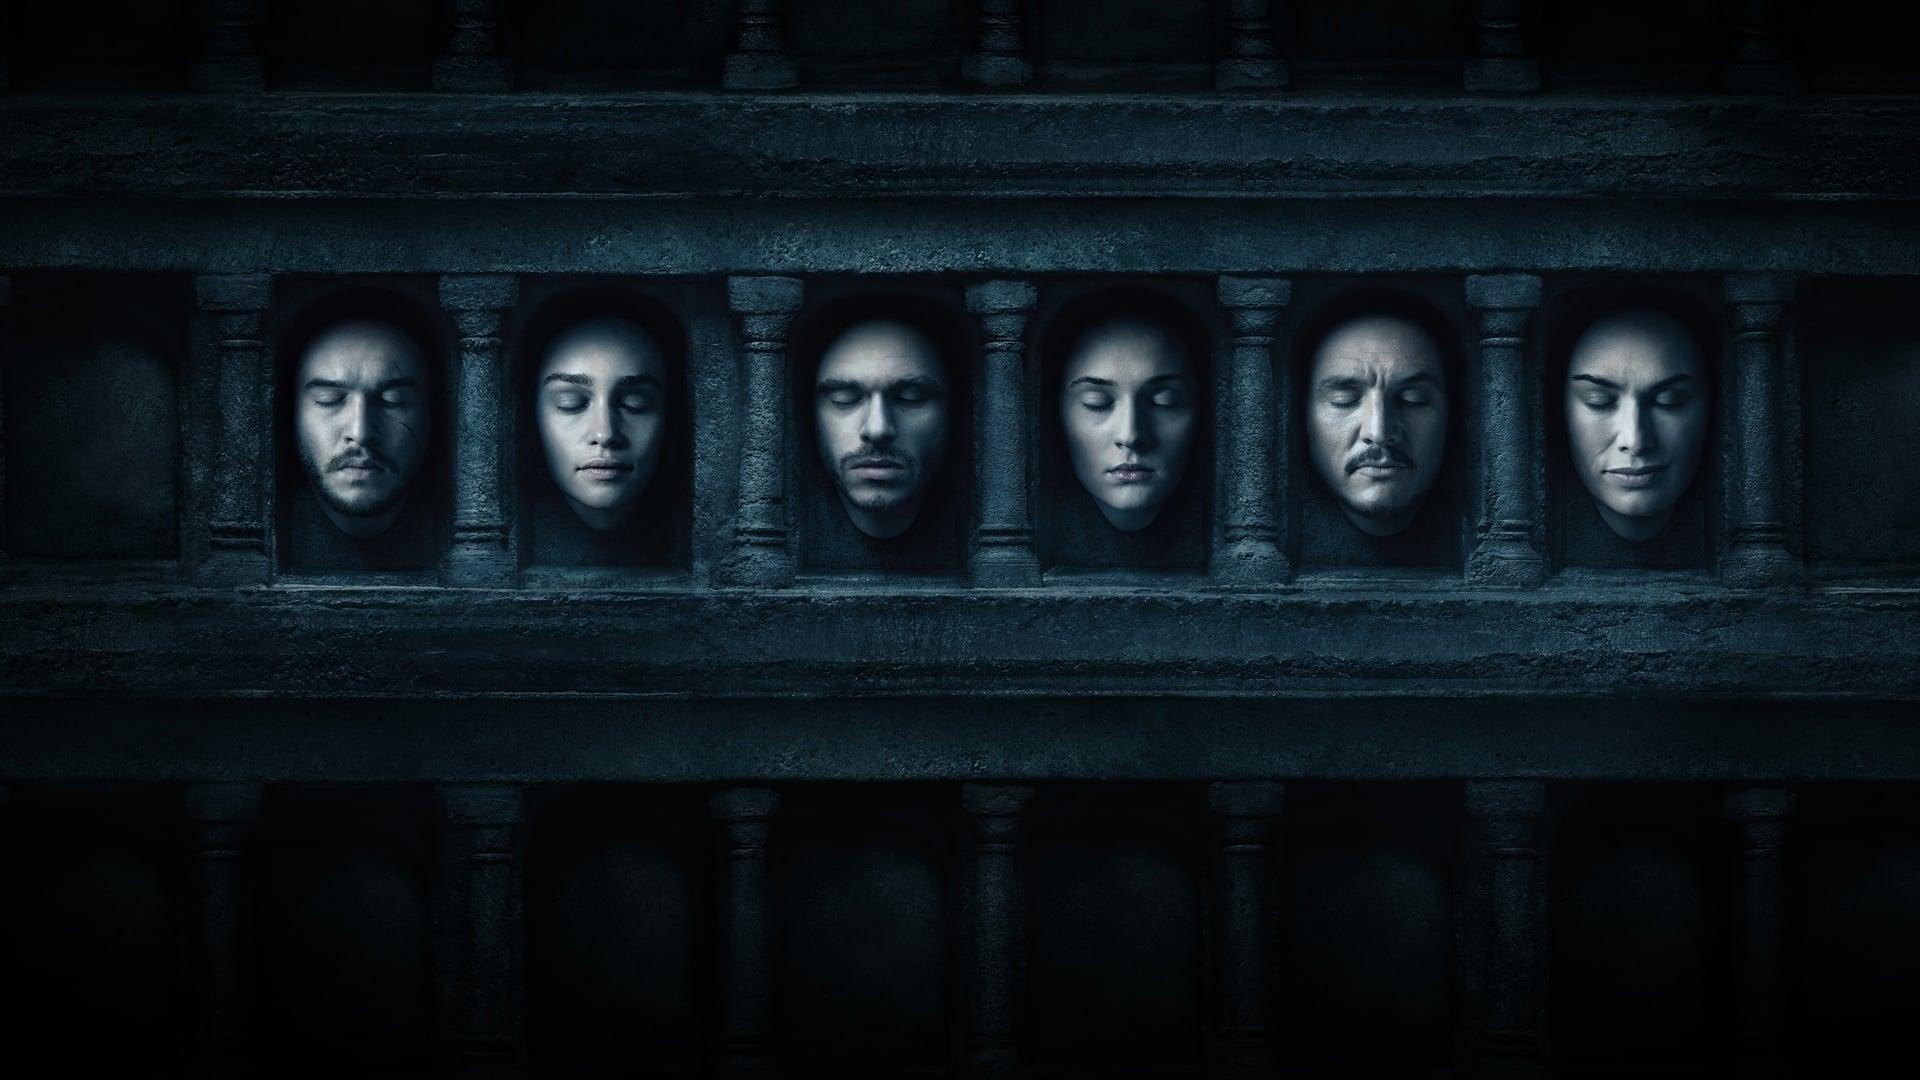 Game of Thrones - Season 5 (1970)